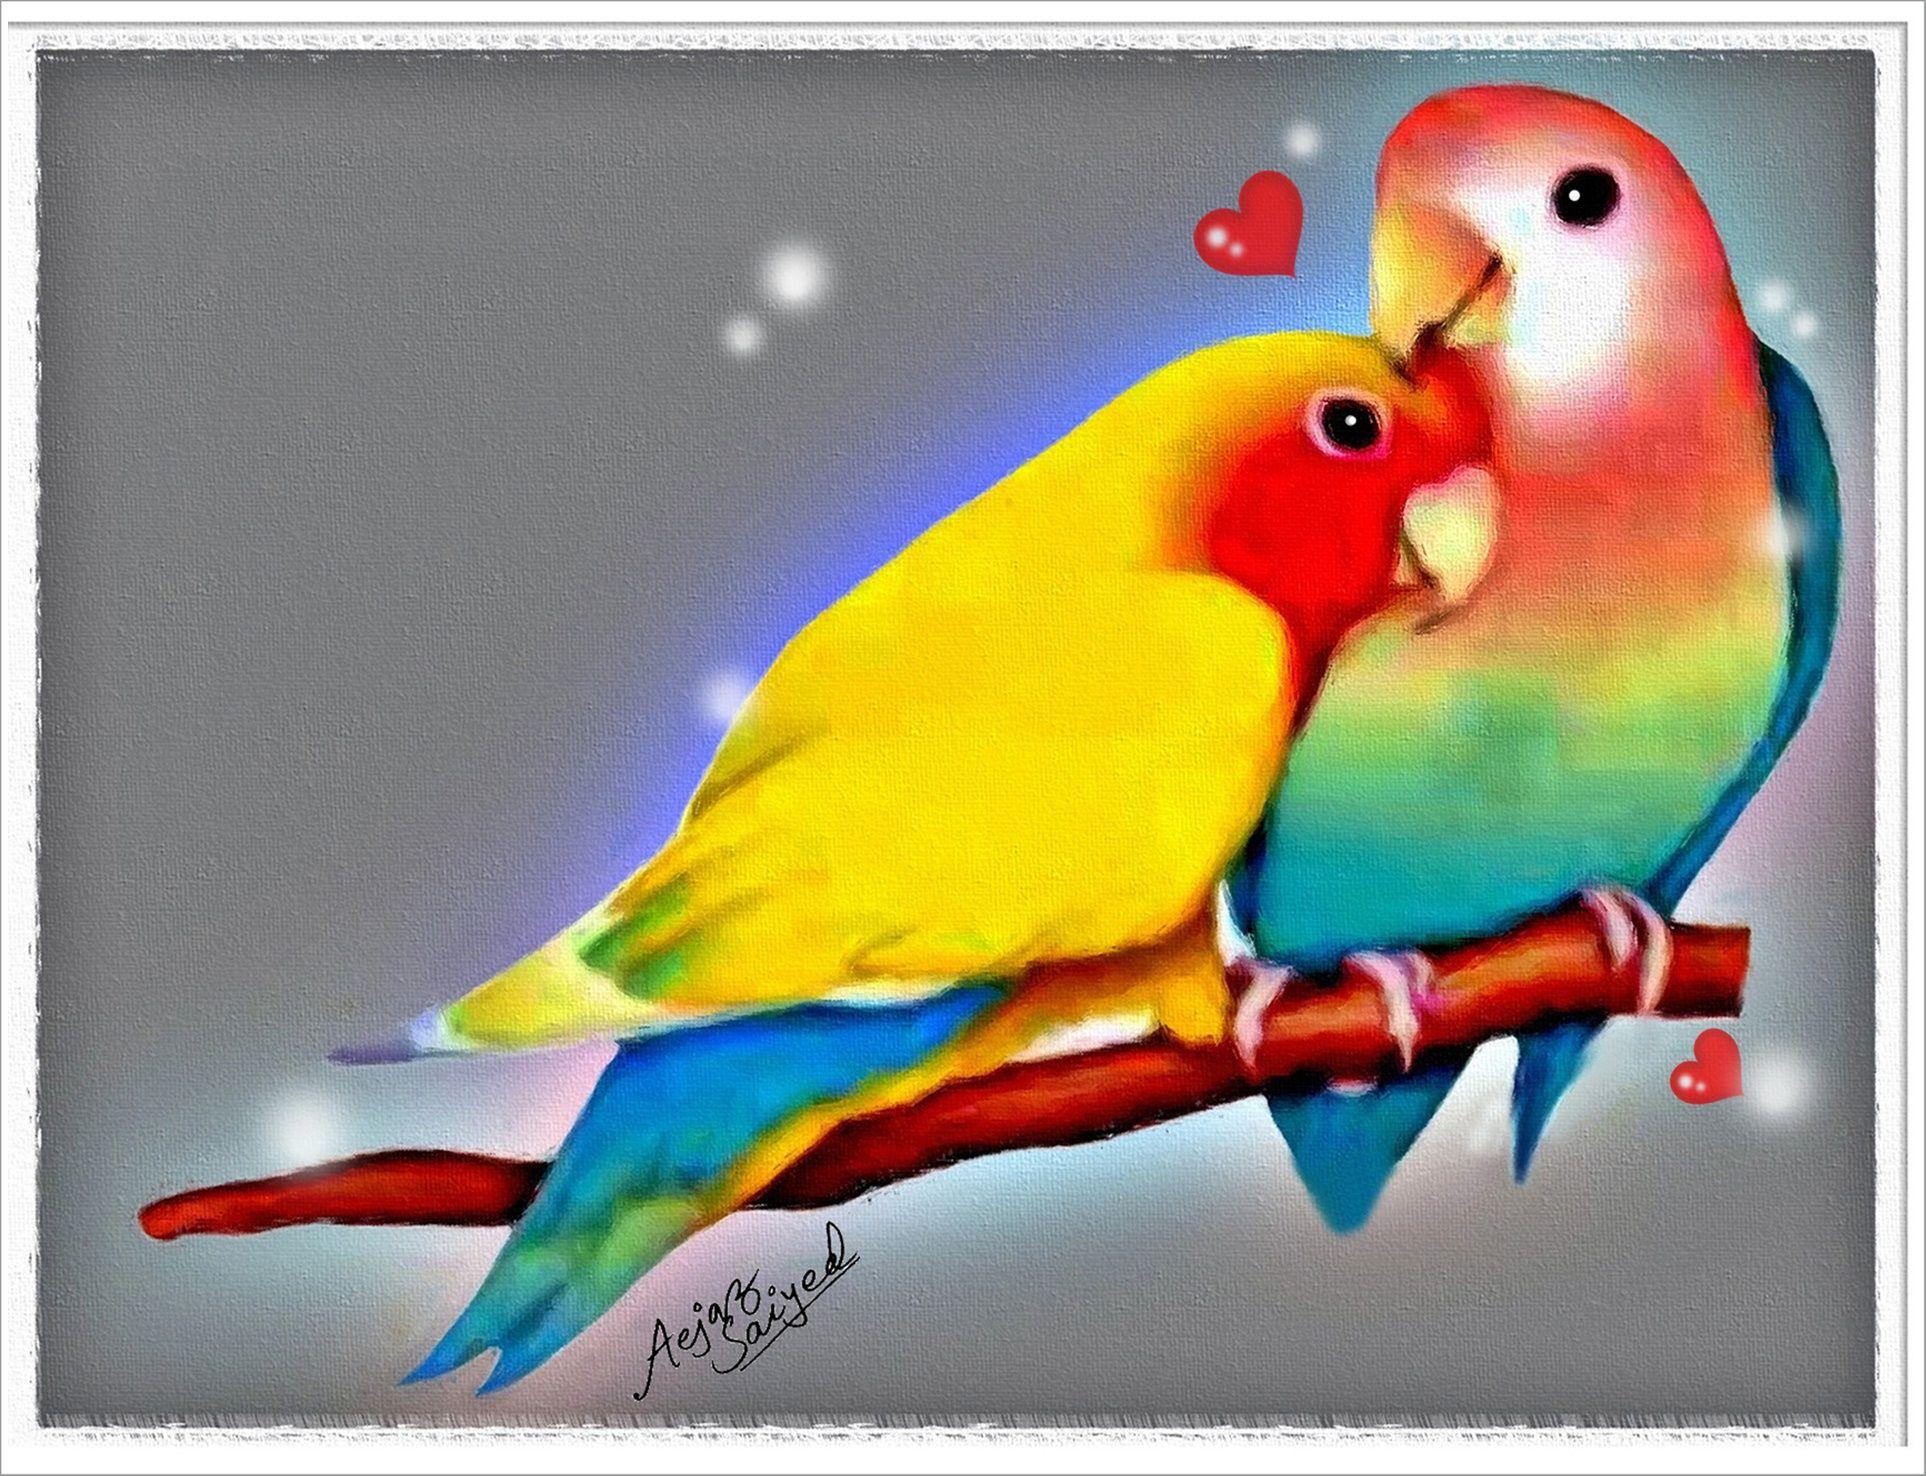 Love Bird Quotes Pictures Of Love Birds  Digital Painting Of Love Birds